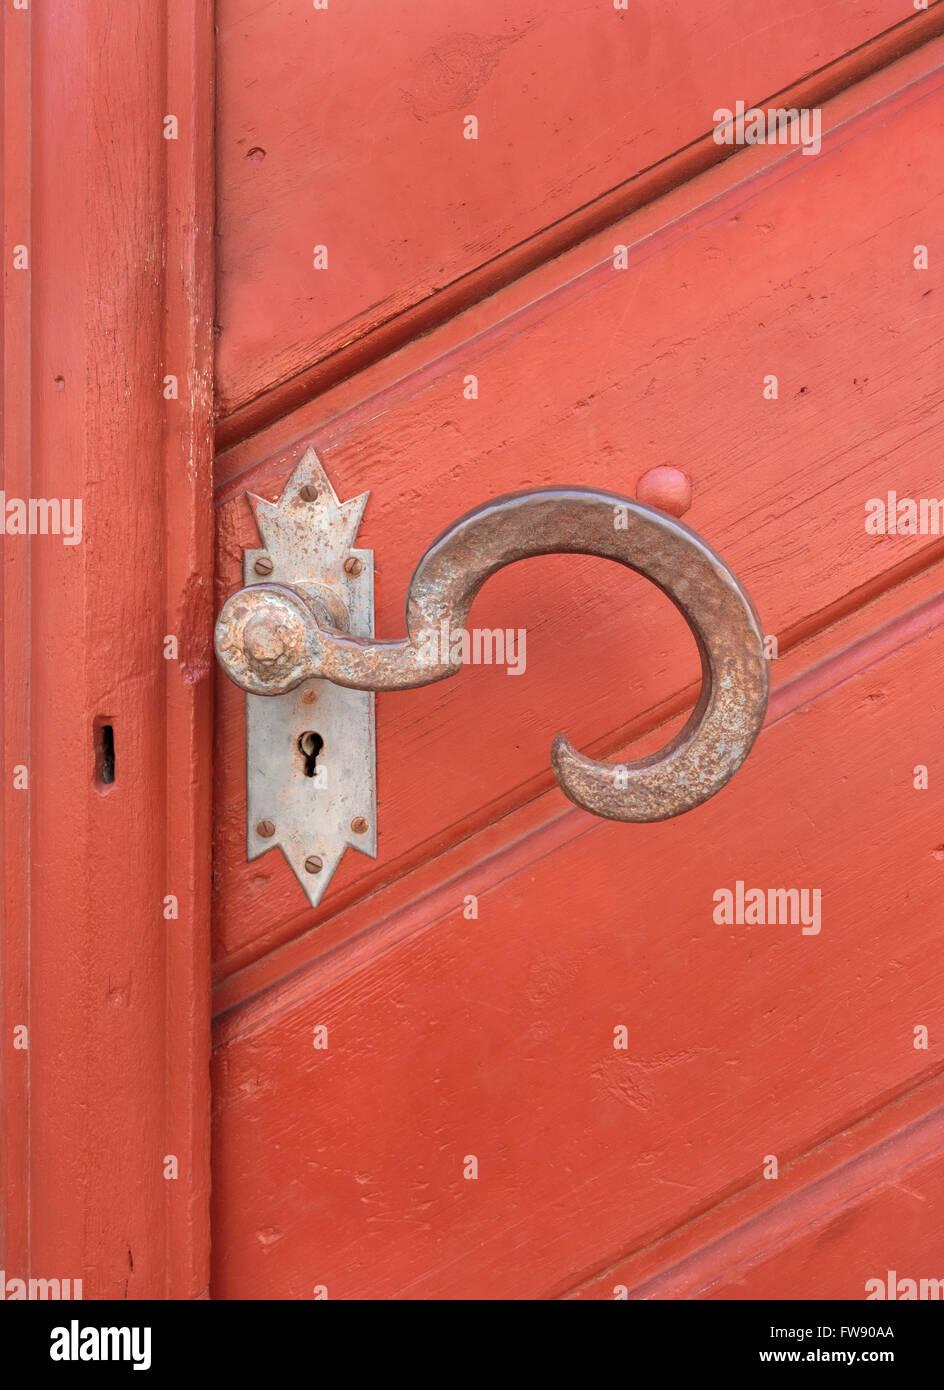 Old, big, artistically curved door handle of rusted metal on a reddish brown wooden door - Stock Image